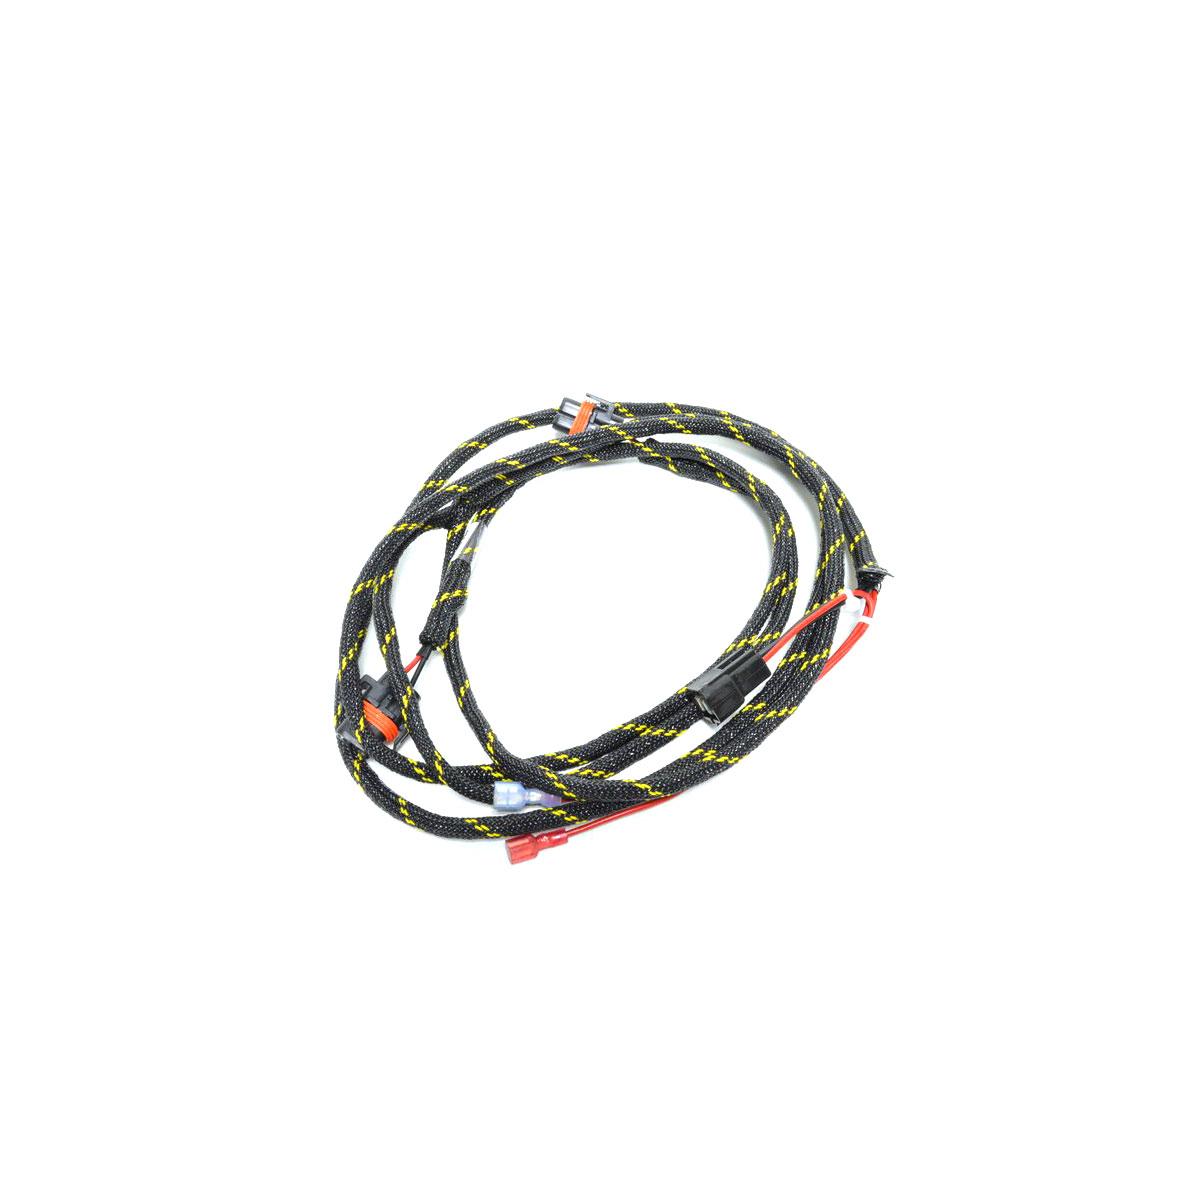 scag lights wire harness scz484271